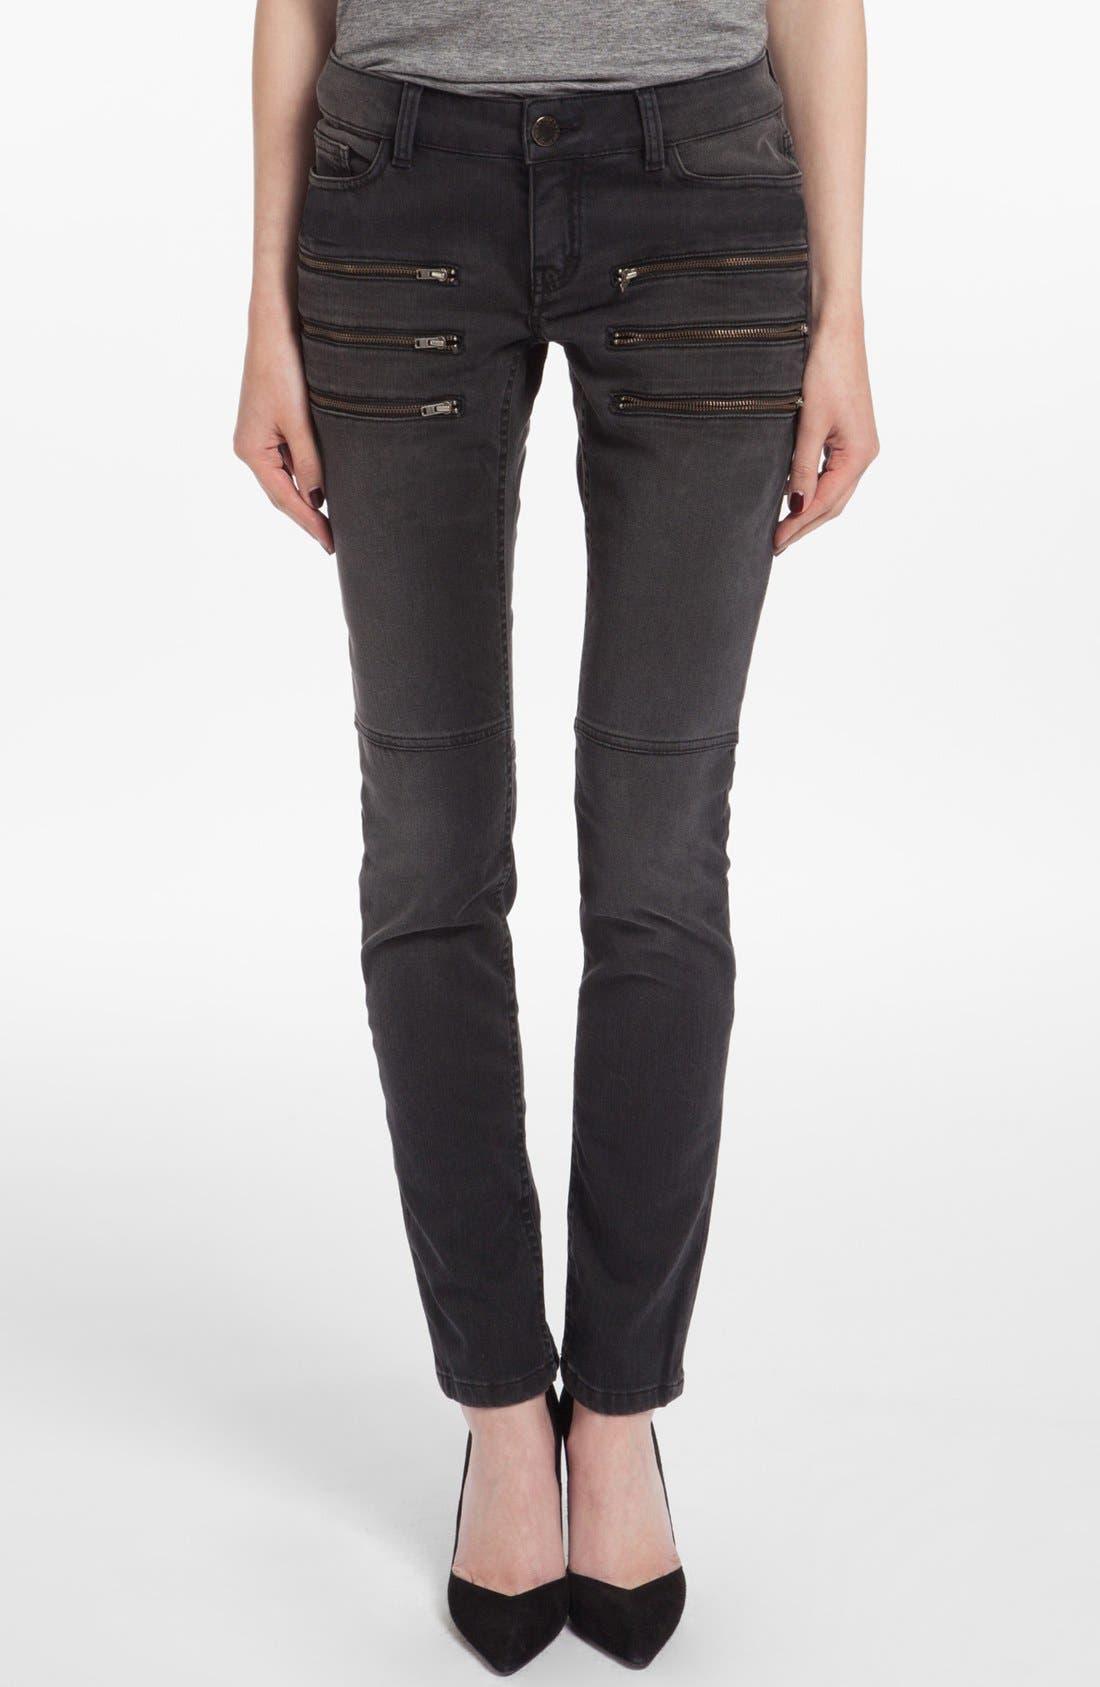 Alternate Image 1 Selected - maje 'Dip' Colored Skinny Jeans (Noir)